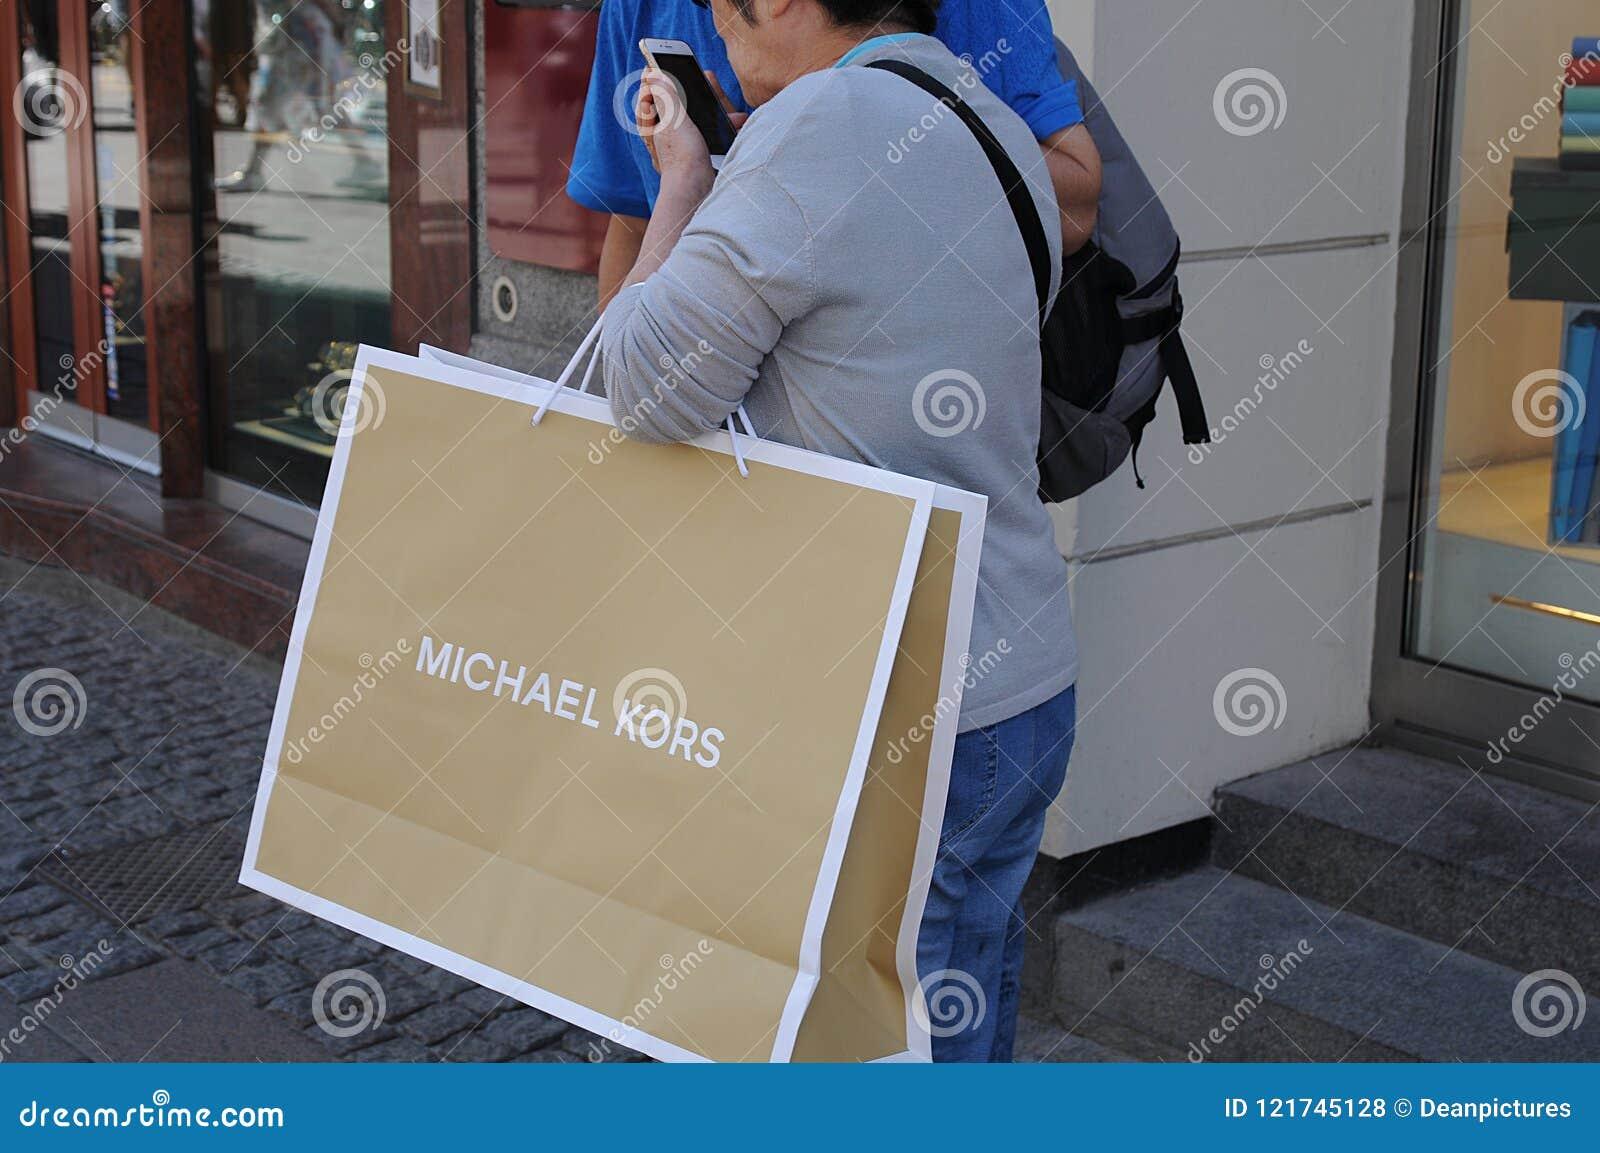 90dc70a589eeee Copenhagen/Denmark 20.JULY 2018_Michael kors hopperw with shopping bag .  Photo.Francis Joseph Dean / Deanpictures.